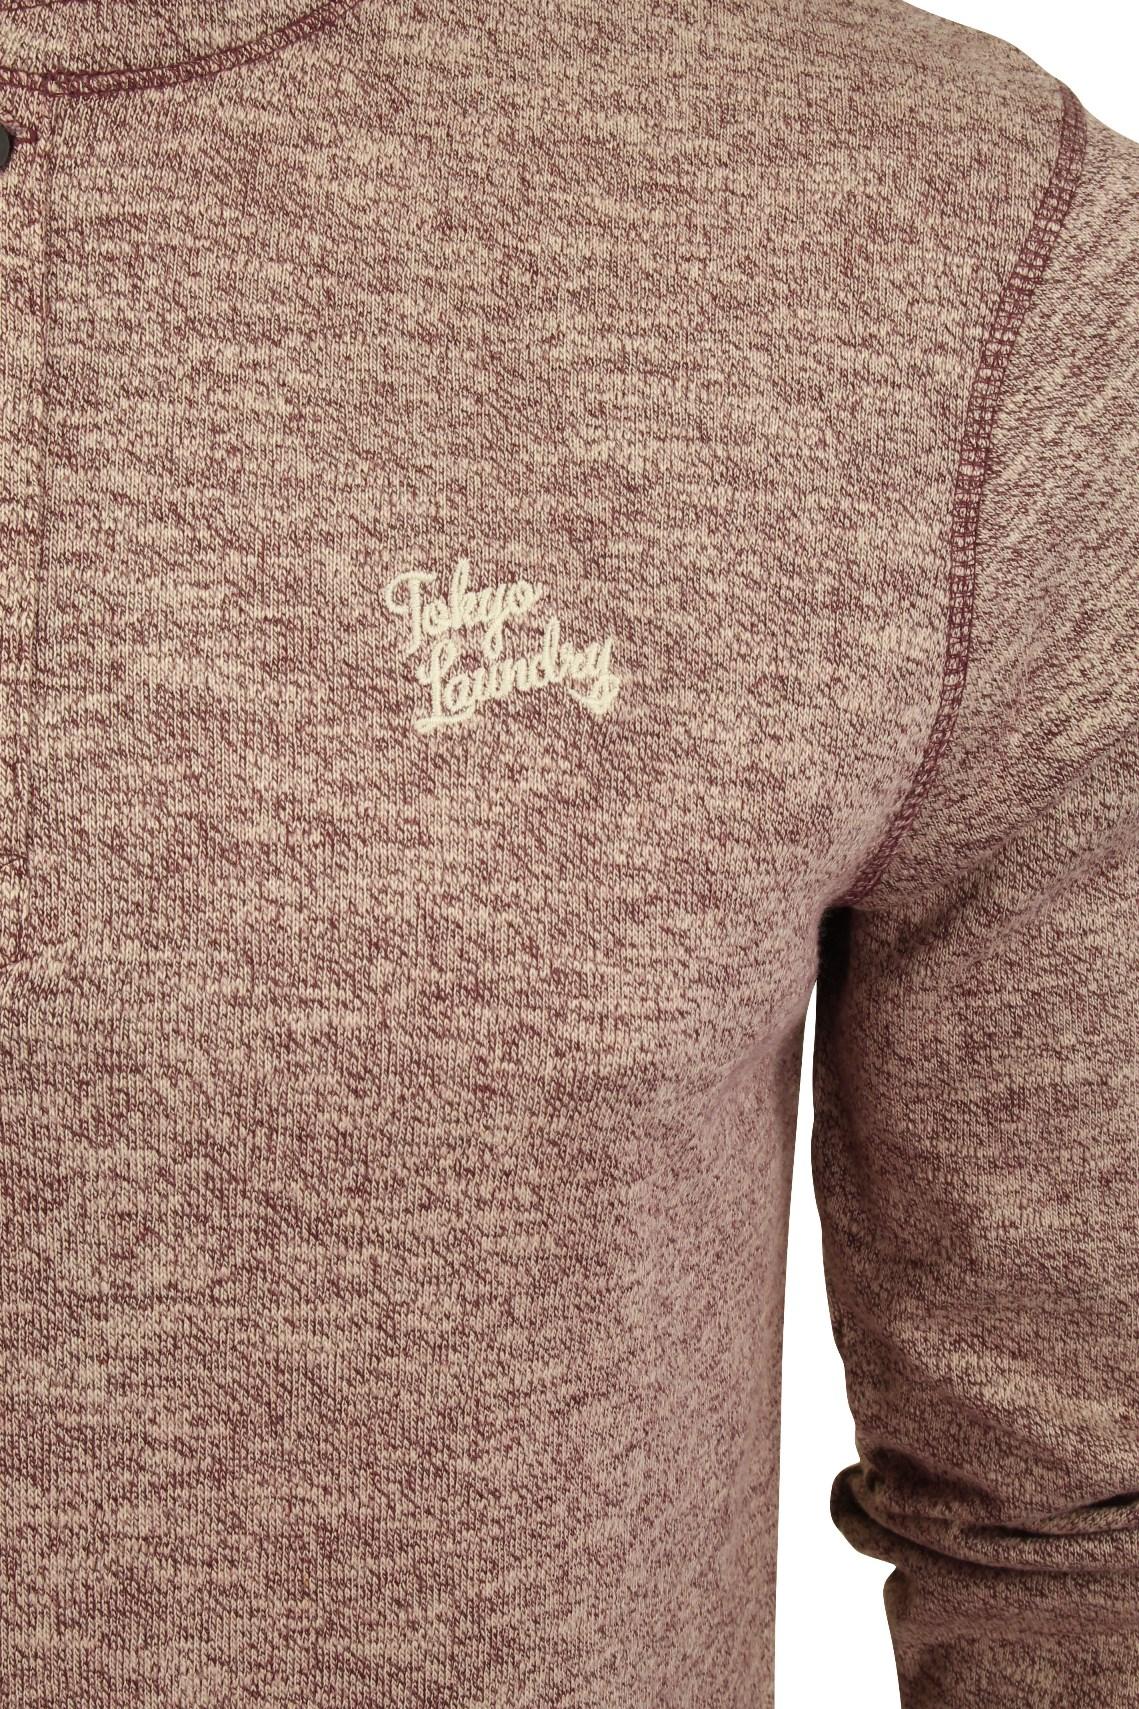 Mens-Long-Sleeve-Grandad-T-Shirt-by-Tokyo-Laundry-039-Roosevelt-039-Siro-Slub-Jersey thumbnail 10